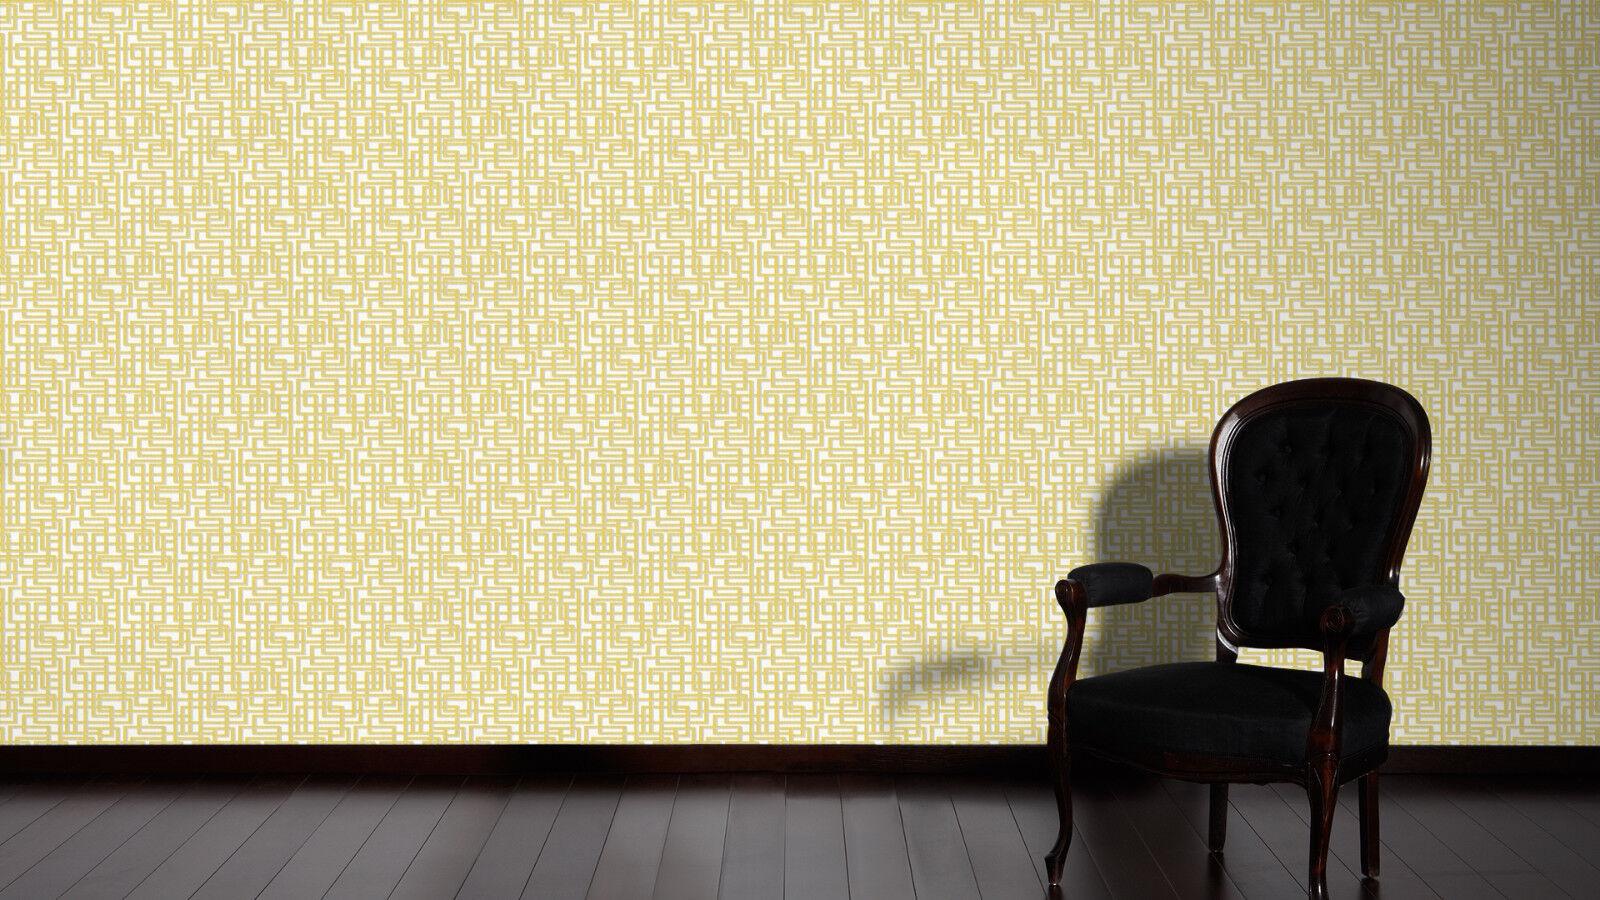 labyrinth muster grafik retro vlies tapete gelb grau wei. Black Bedroom Furniture Sets. Home Design Ideas